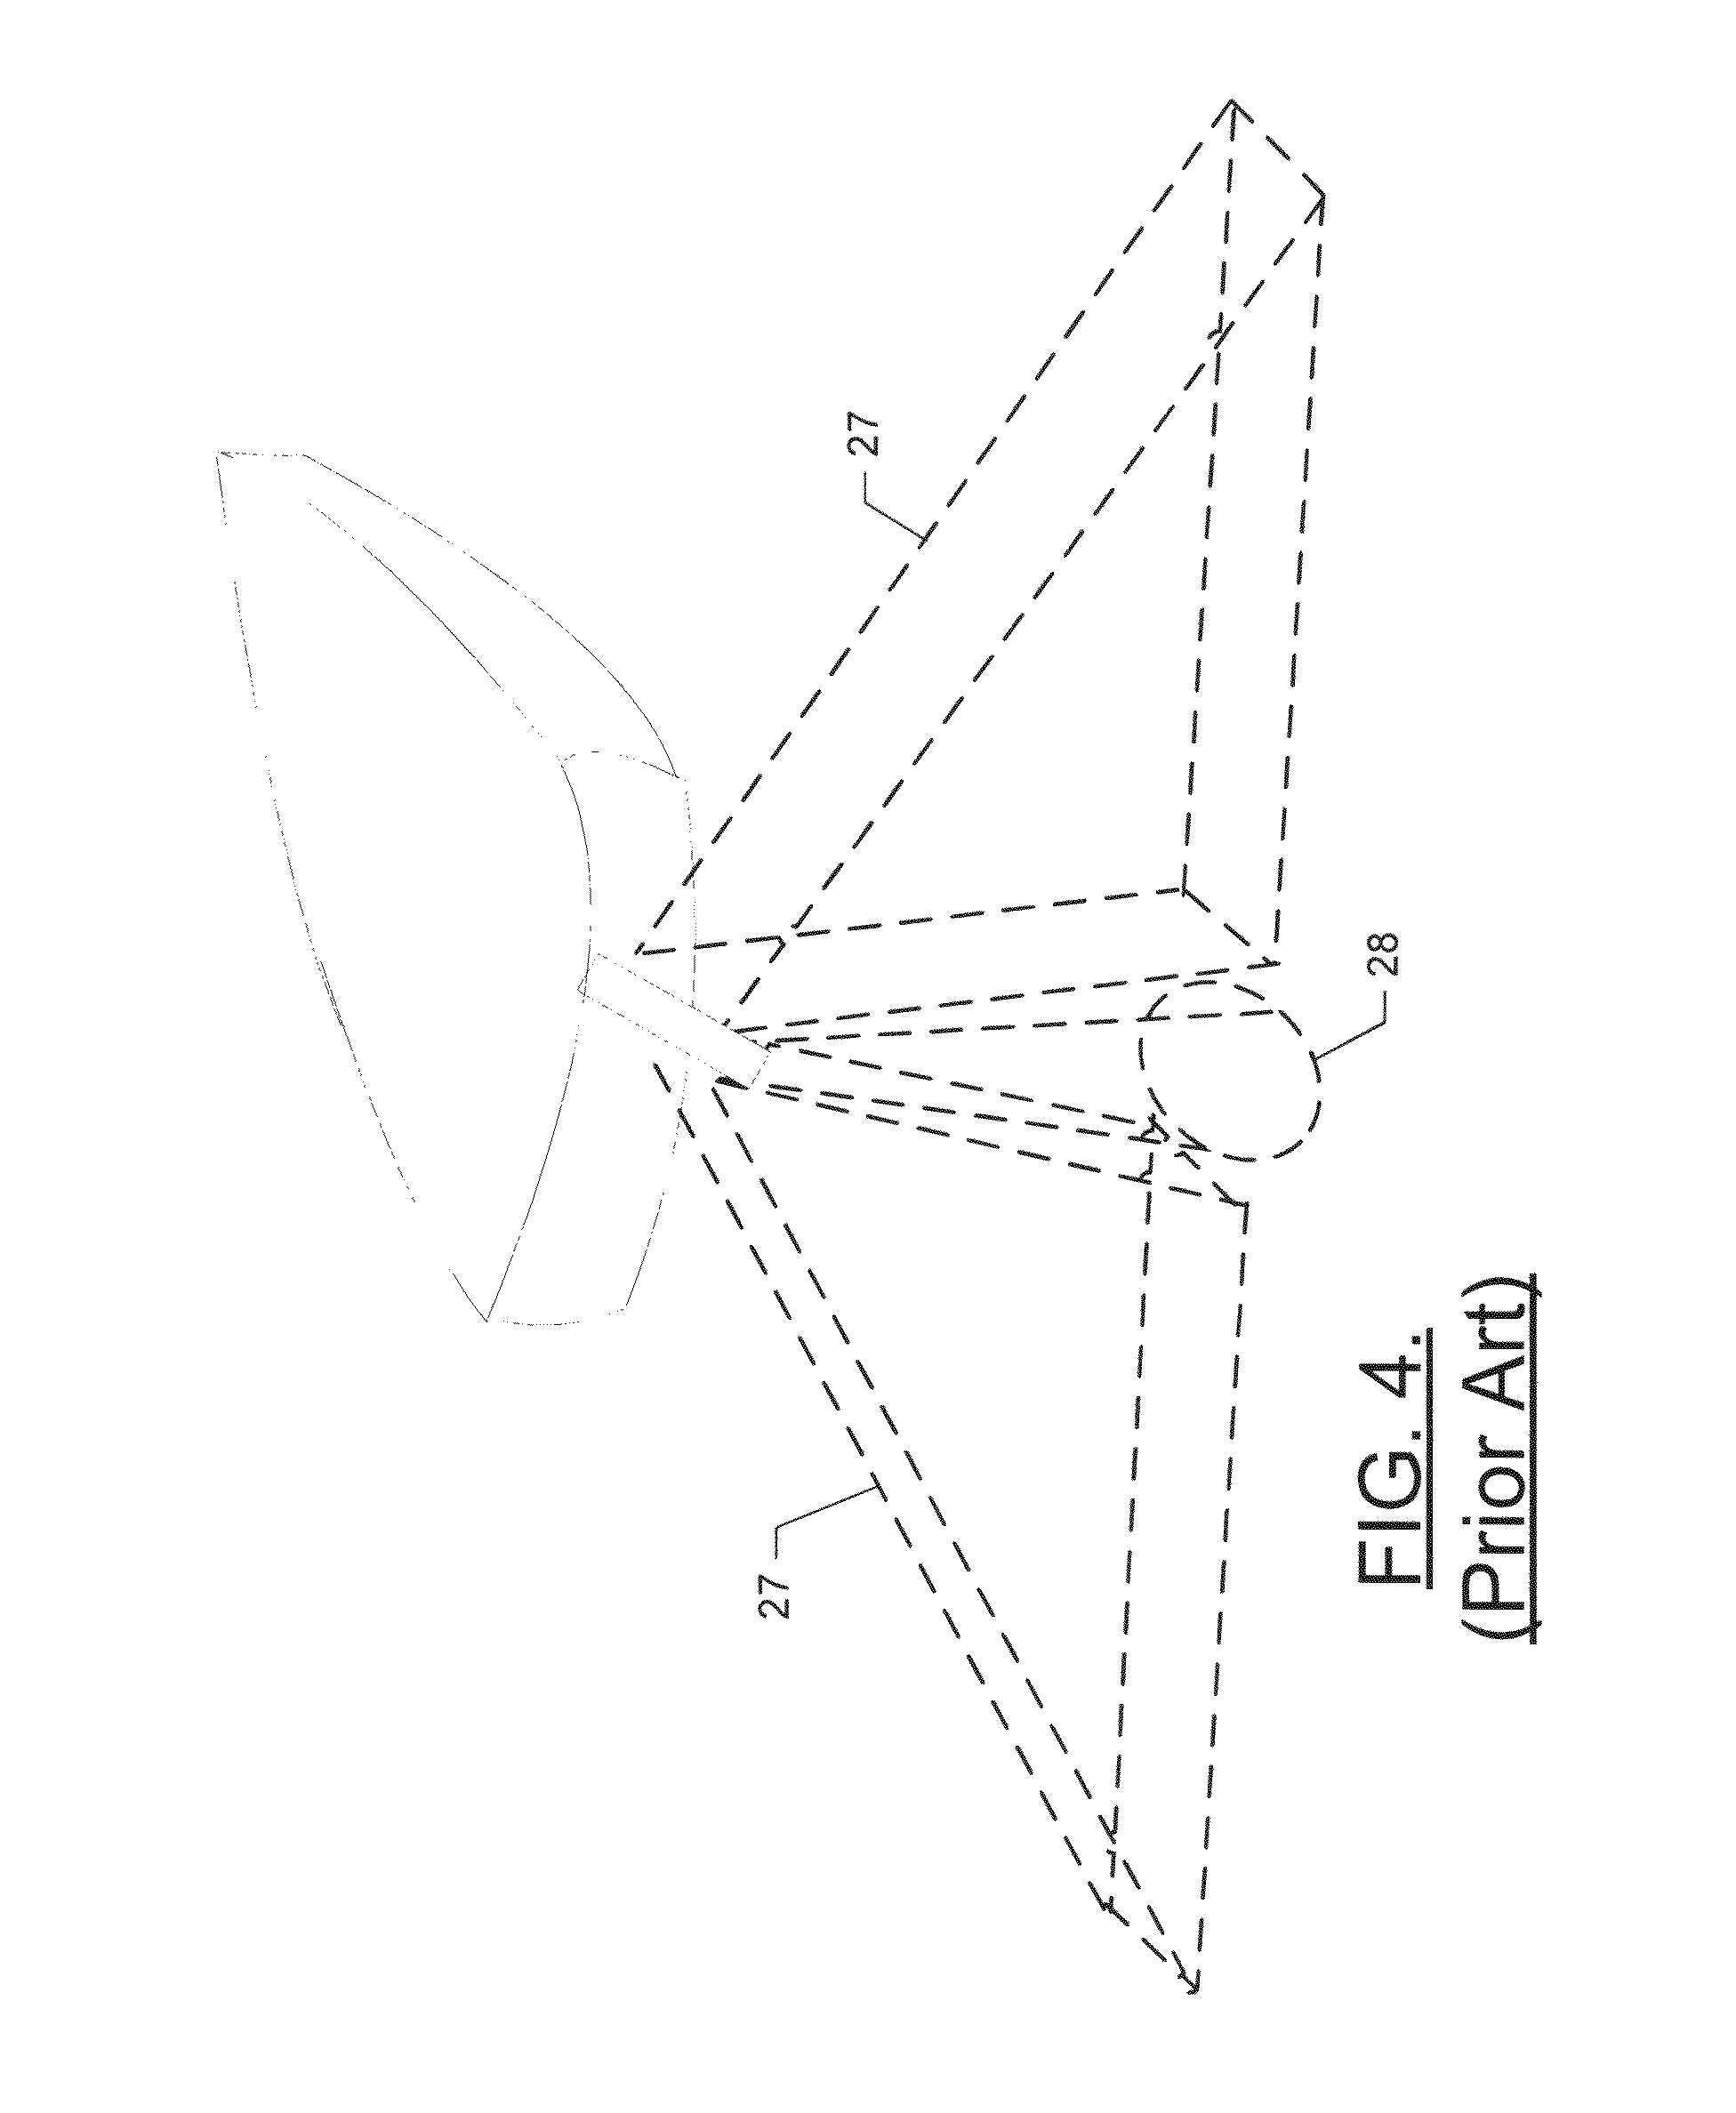 91 eagle talon wiring diagram dodge viper wiring diagram geo storm 95 eagle vision wiring diagram